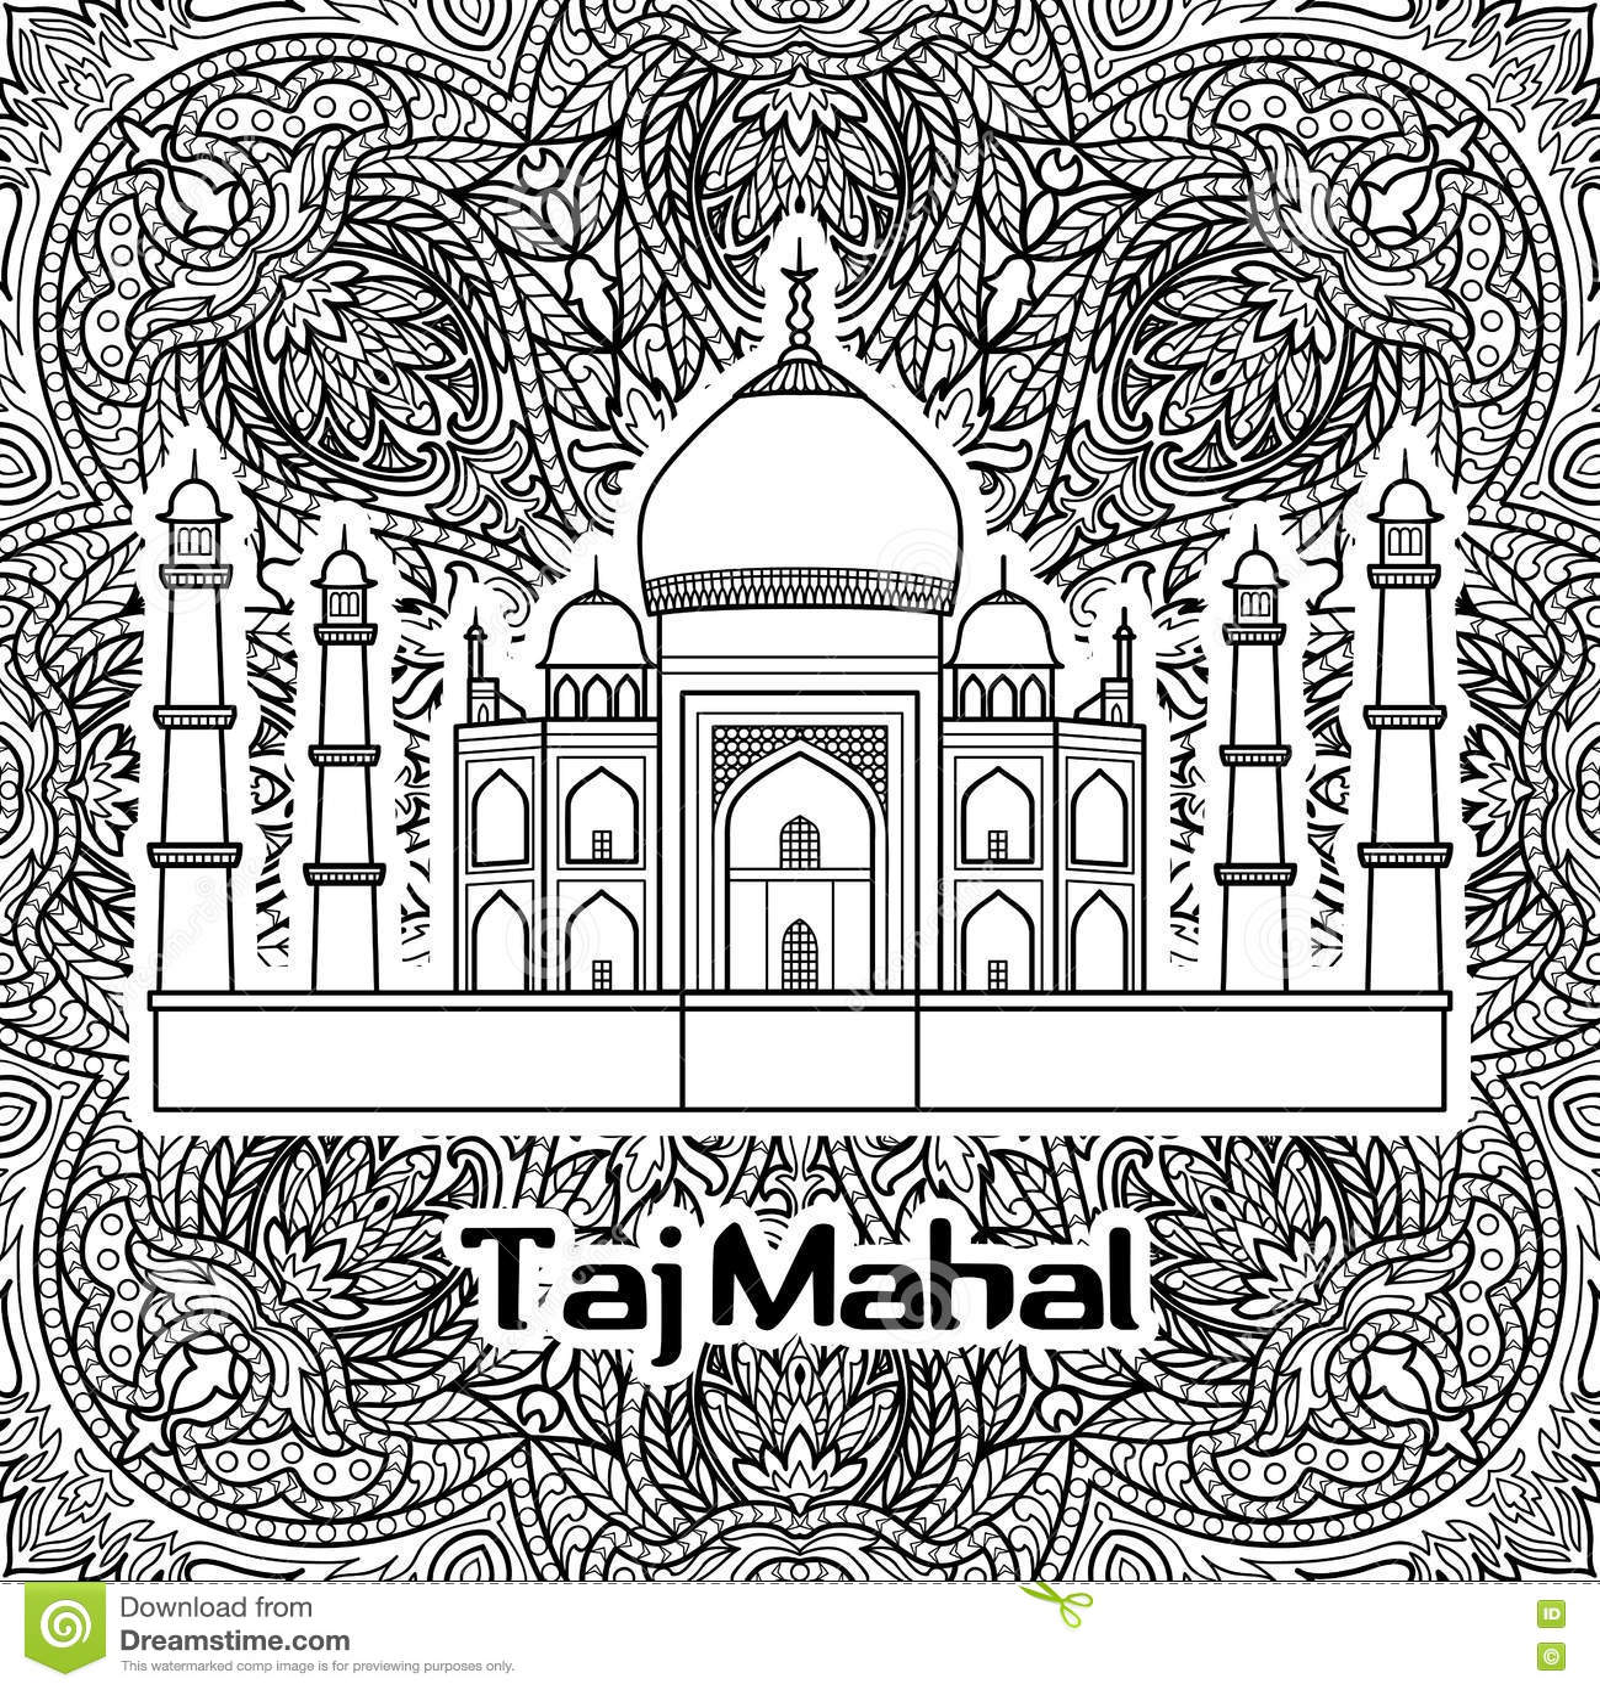 taj mahal coloring page top like this item with taj mahal